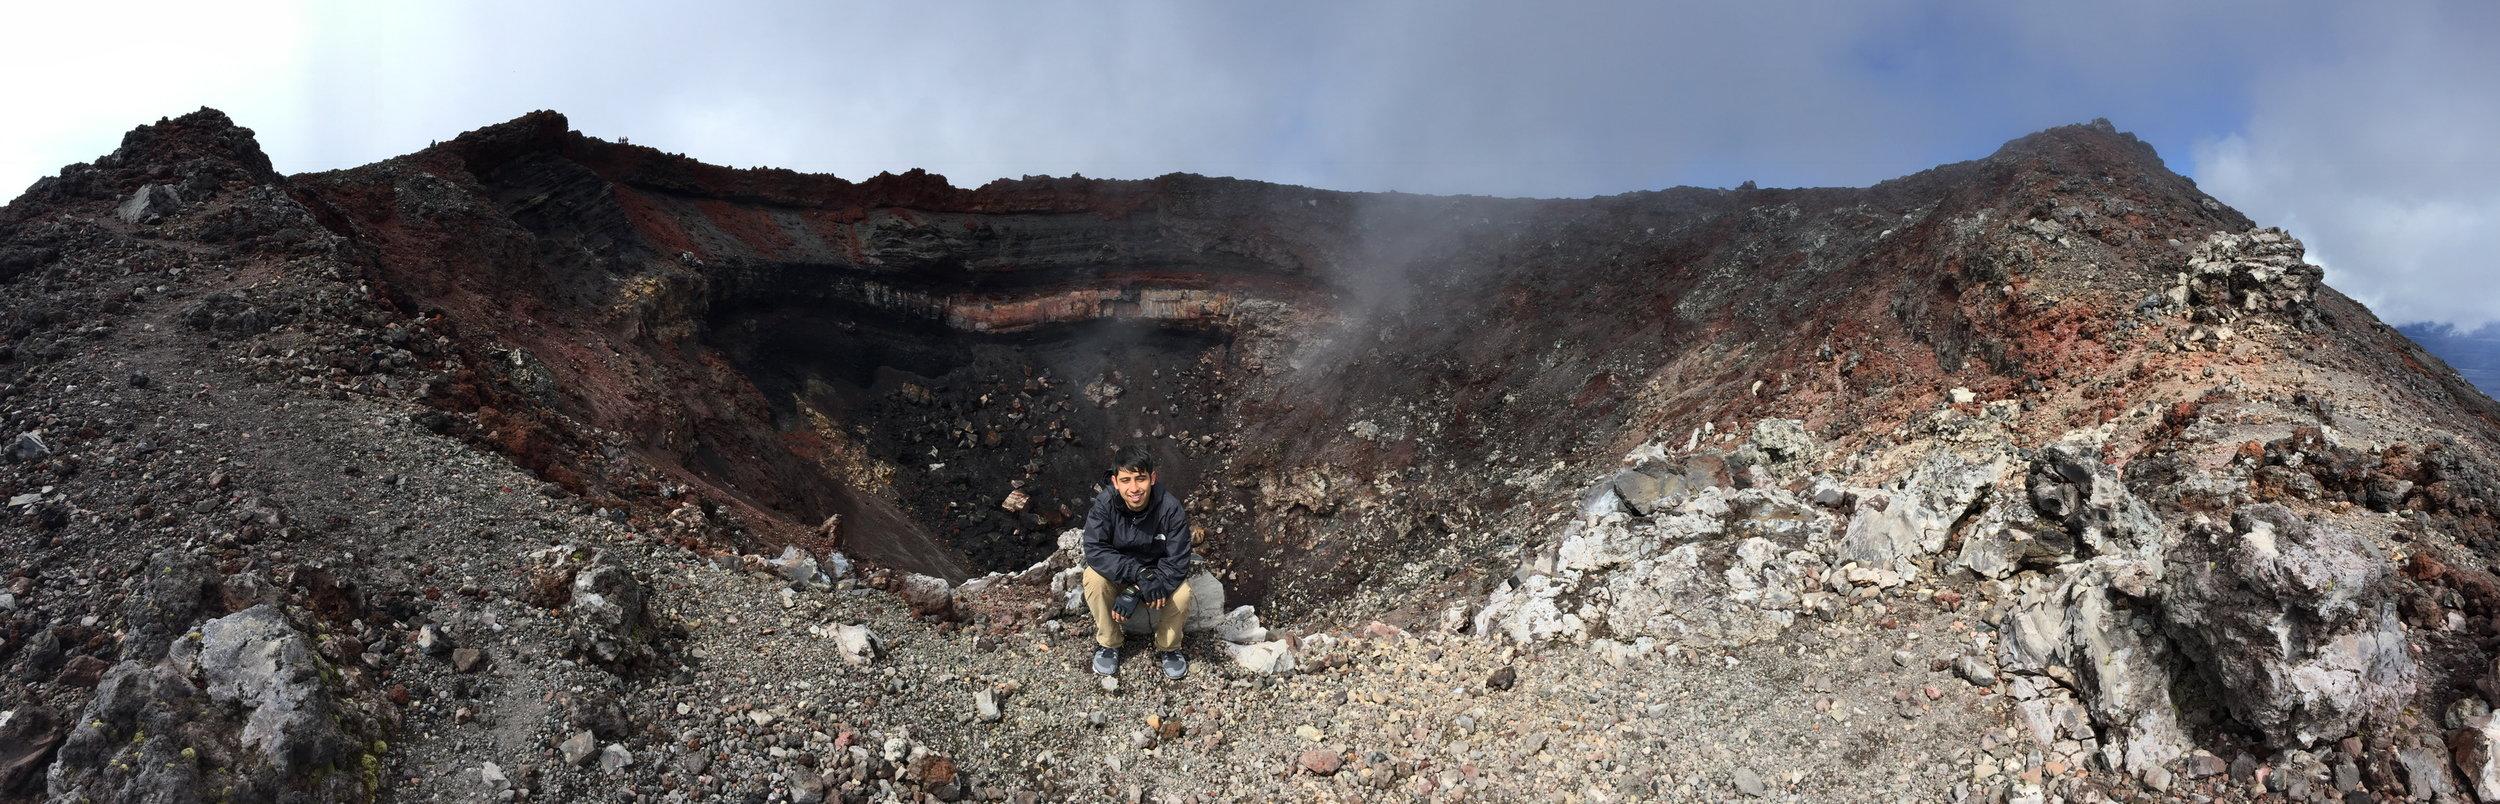 March 2017 - On top of the volcano  Mount Ngauruhoe in  New Zealand